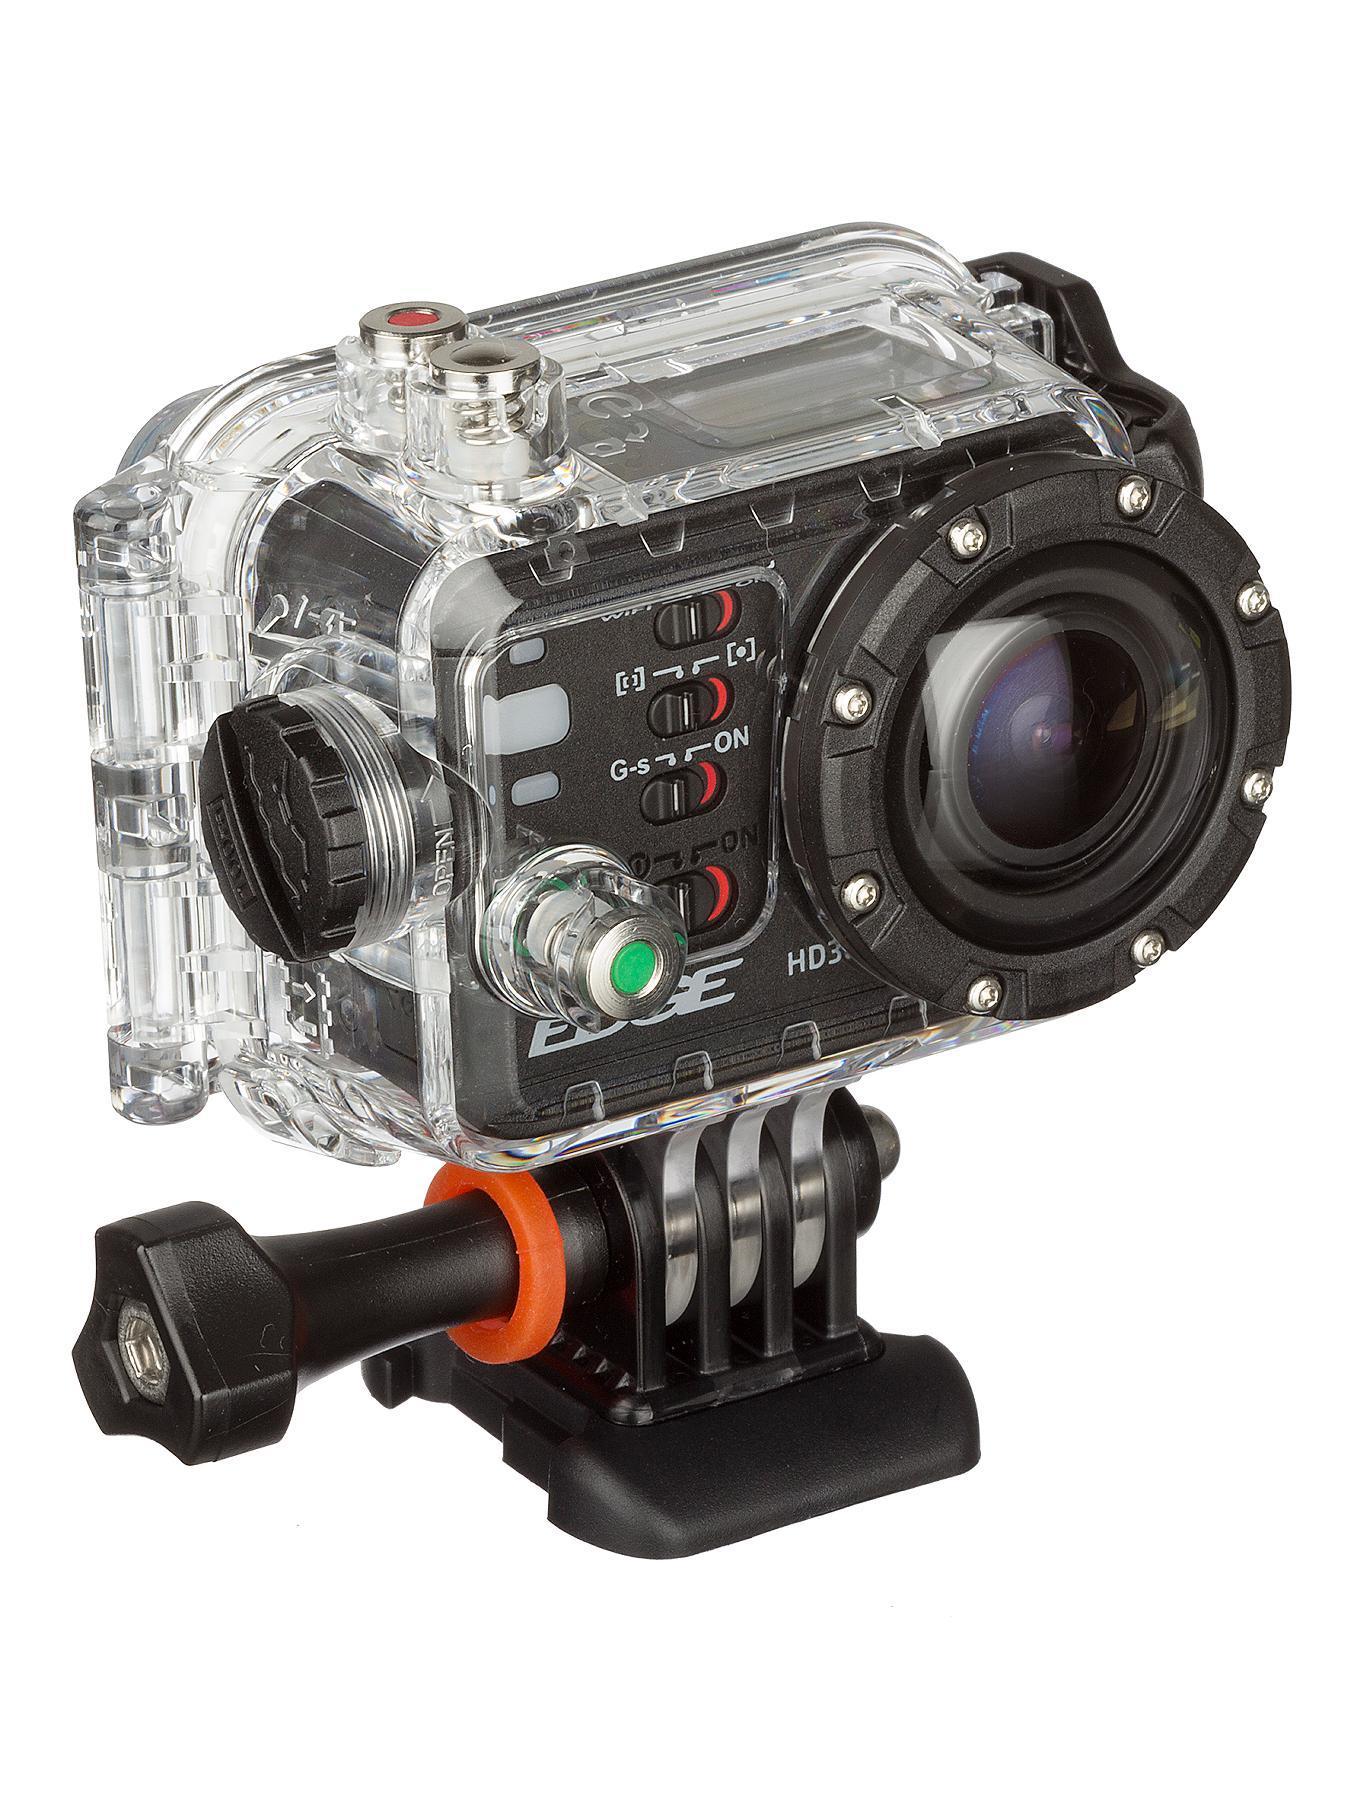 Kitvision Edge HD30W Action Camera - Black